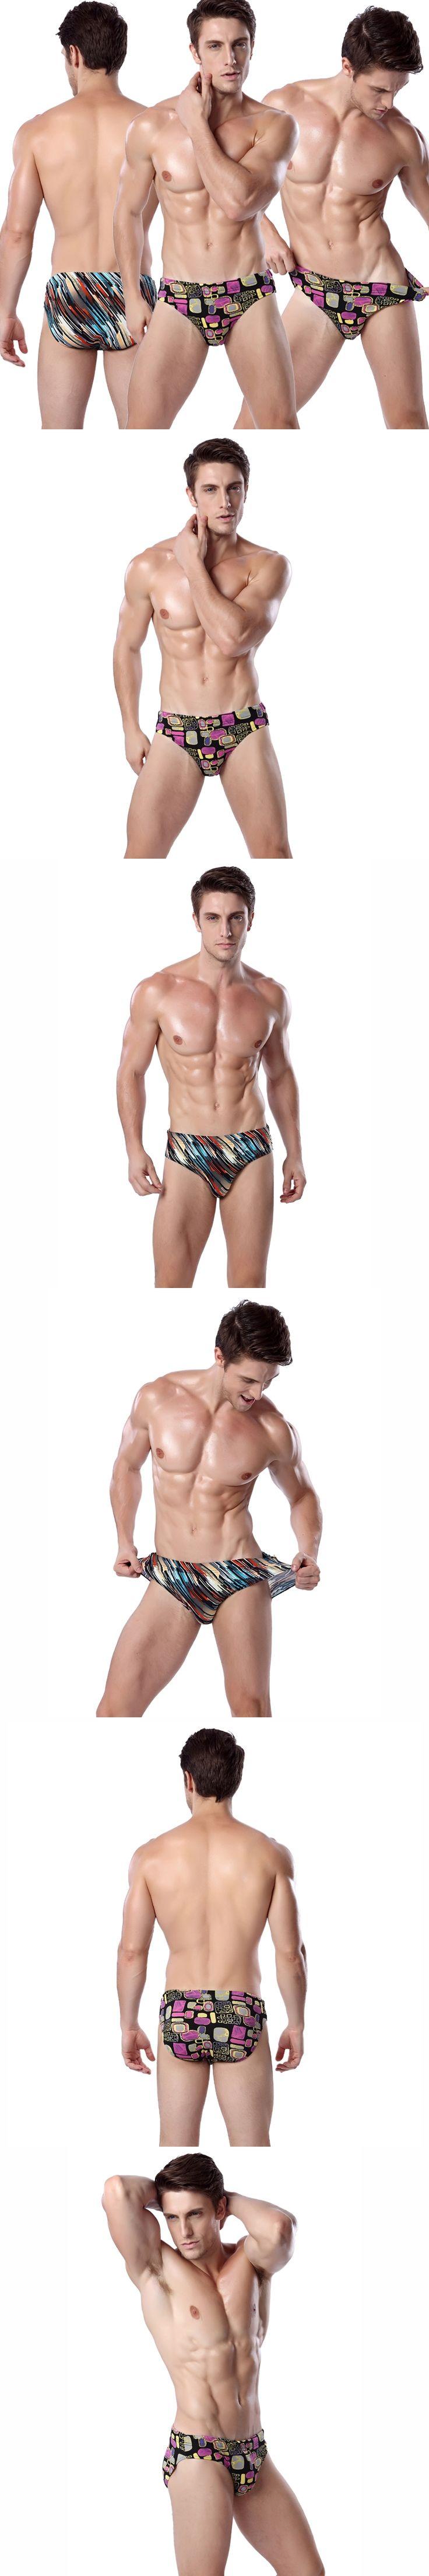 Classic Design Mens Swimming Shorts 2017 Plus Size 3XL European Swimwear for Men Vintage Prints Mens Bathing Shorts